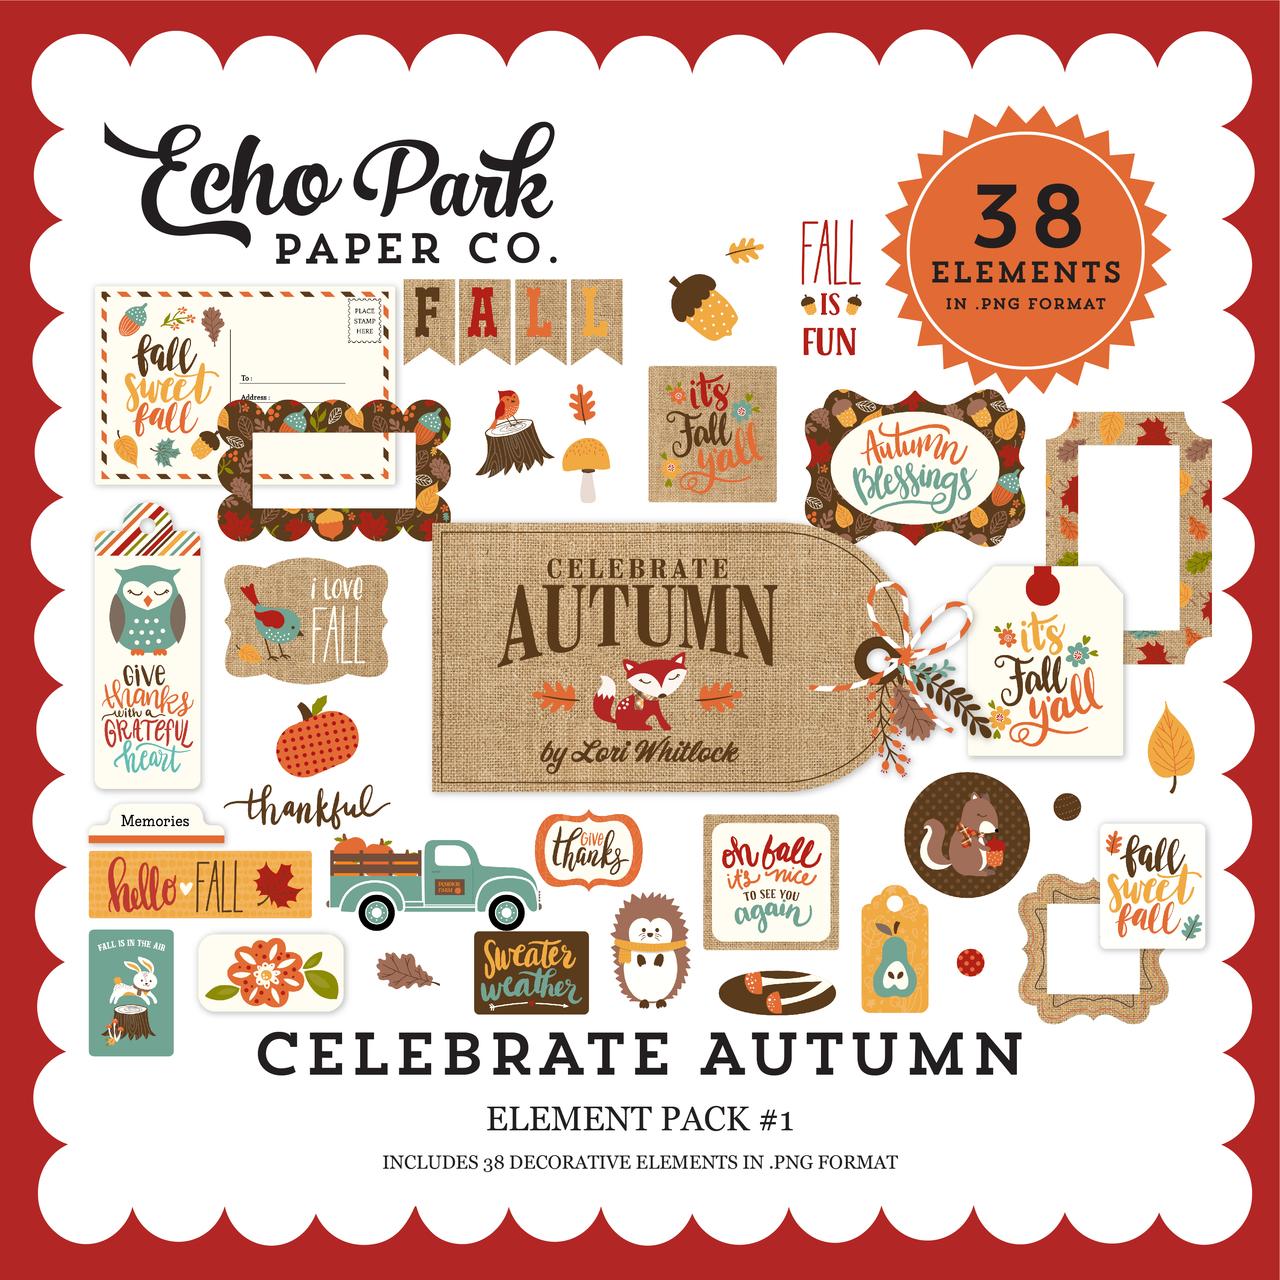 Celebrate Autumn Element Pack #1